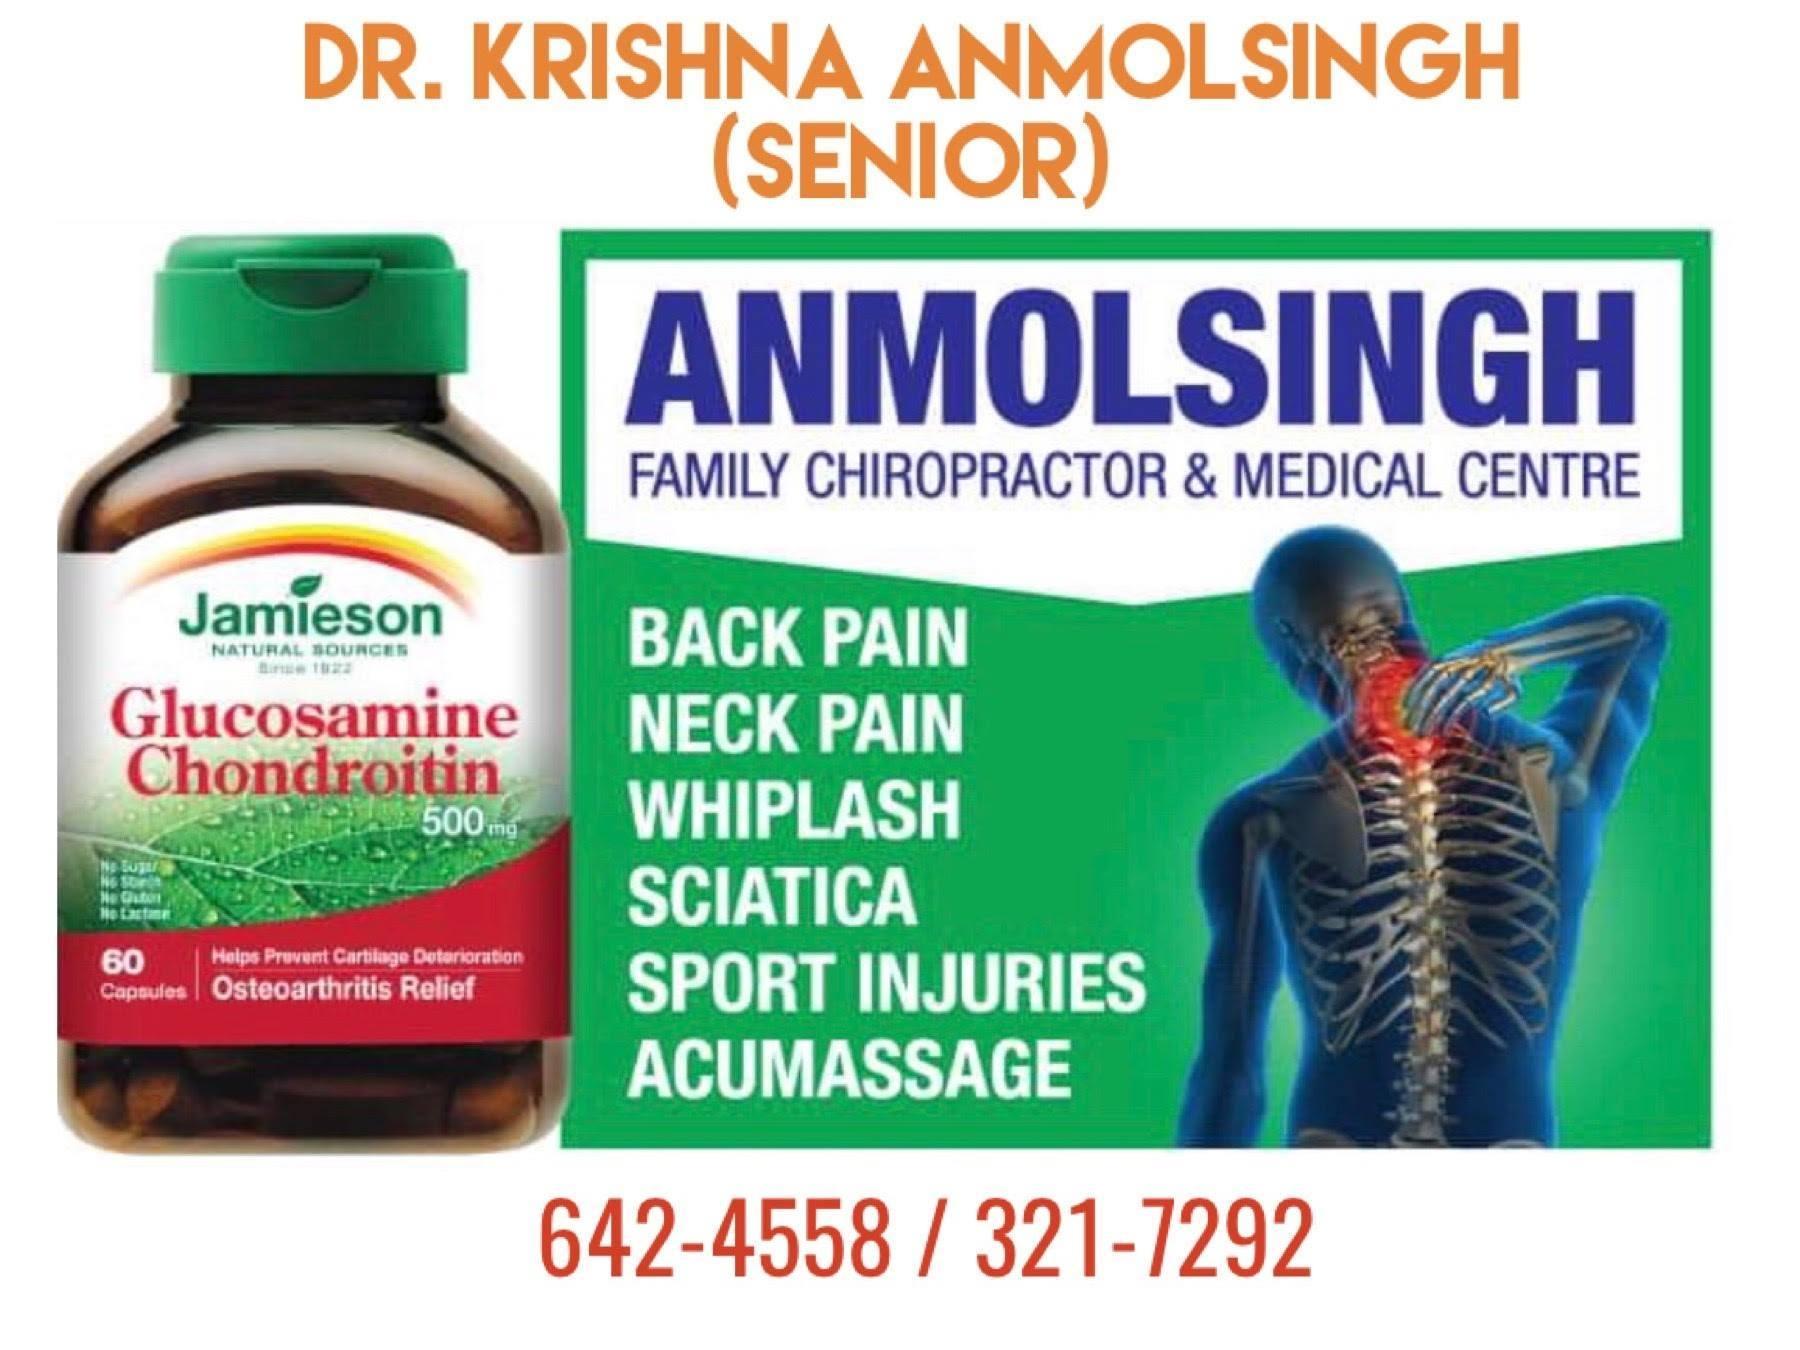 Dr. Krishna Anmolsingh